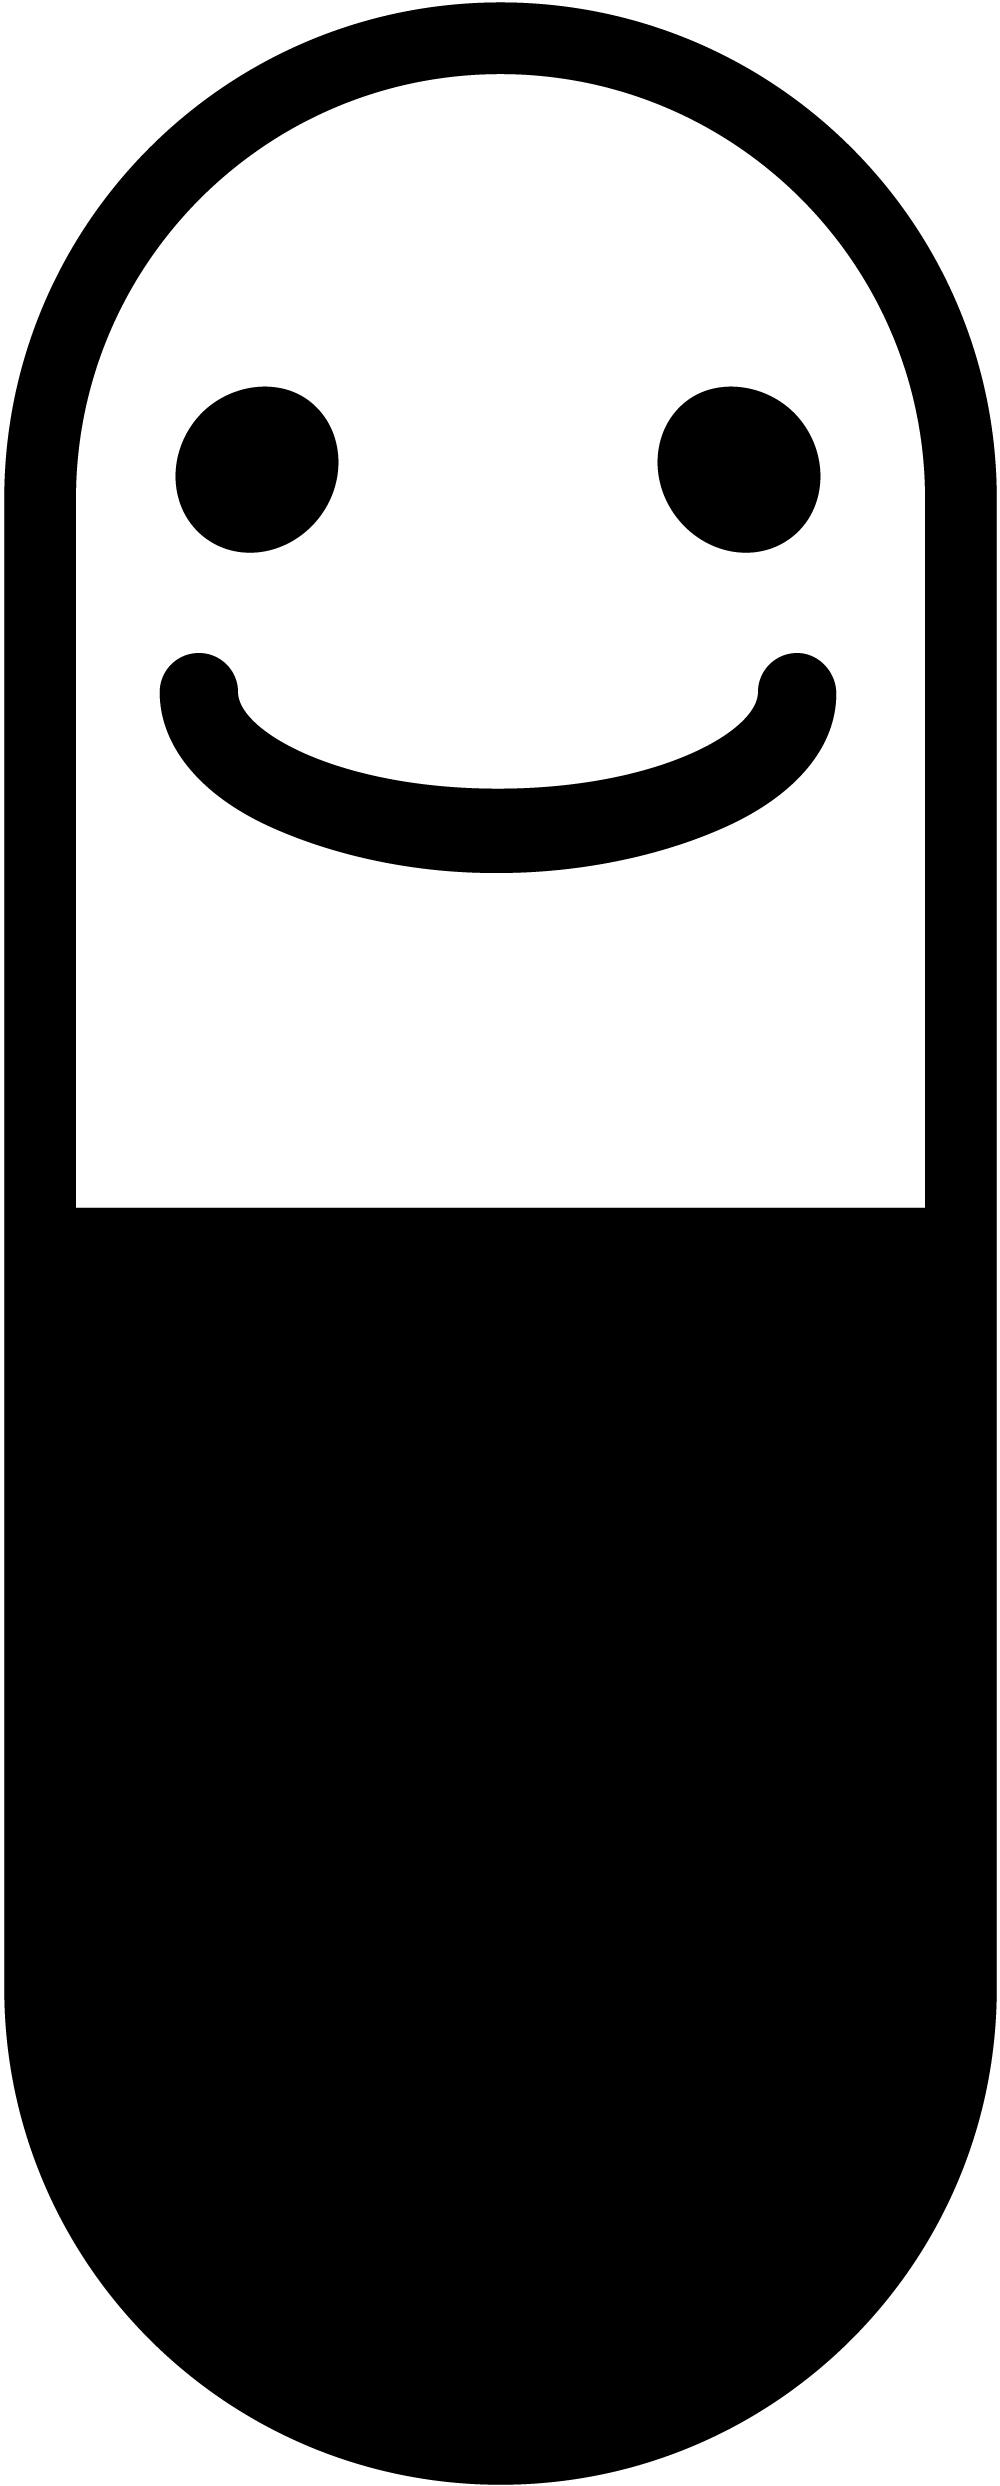 TINKY-PILL.jpg